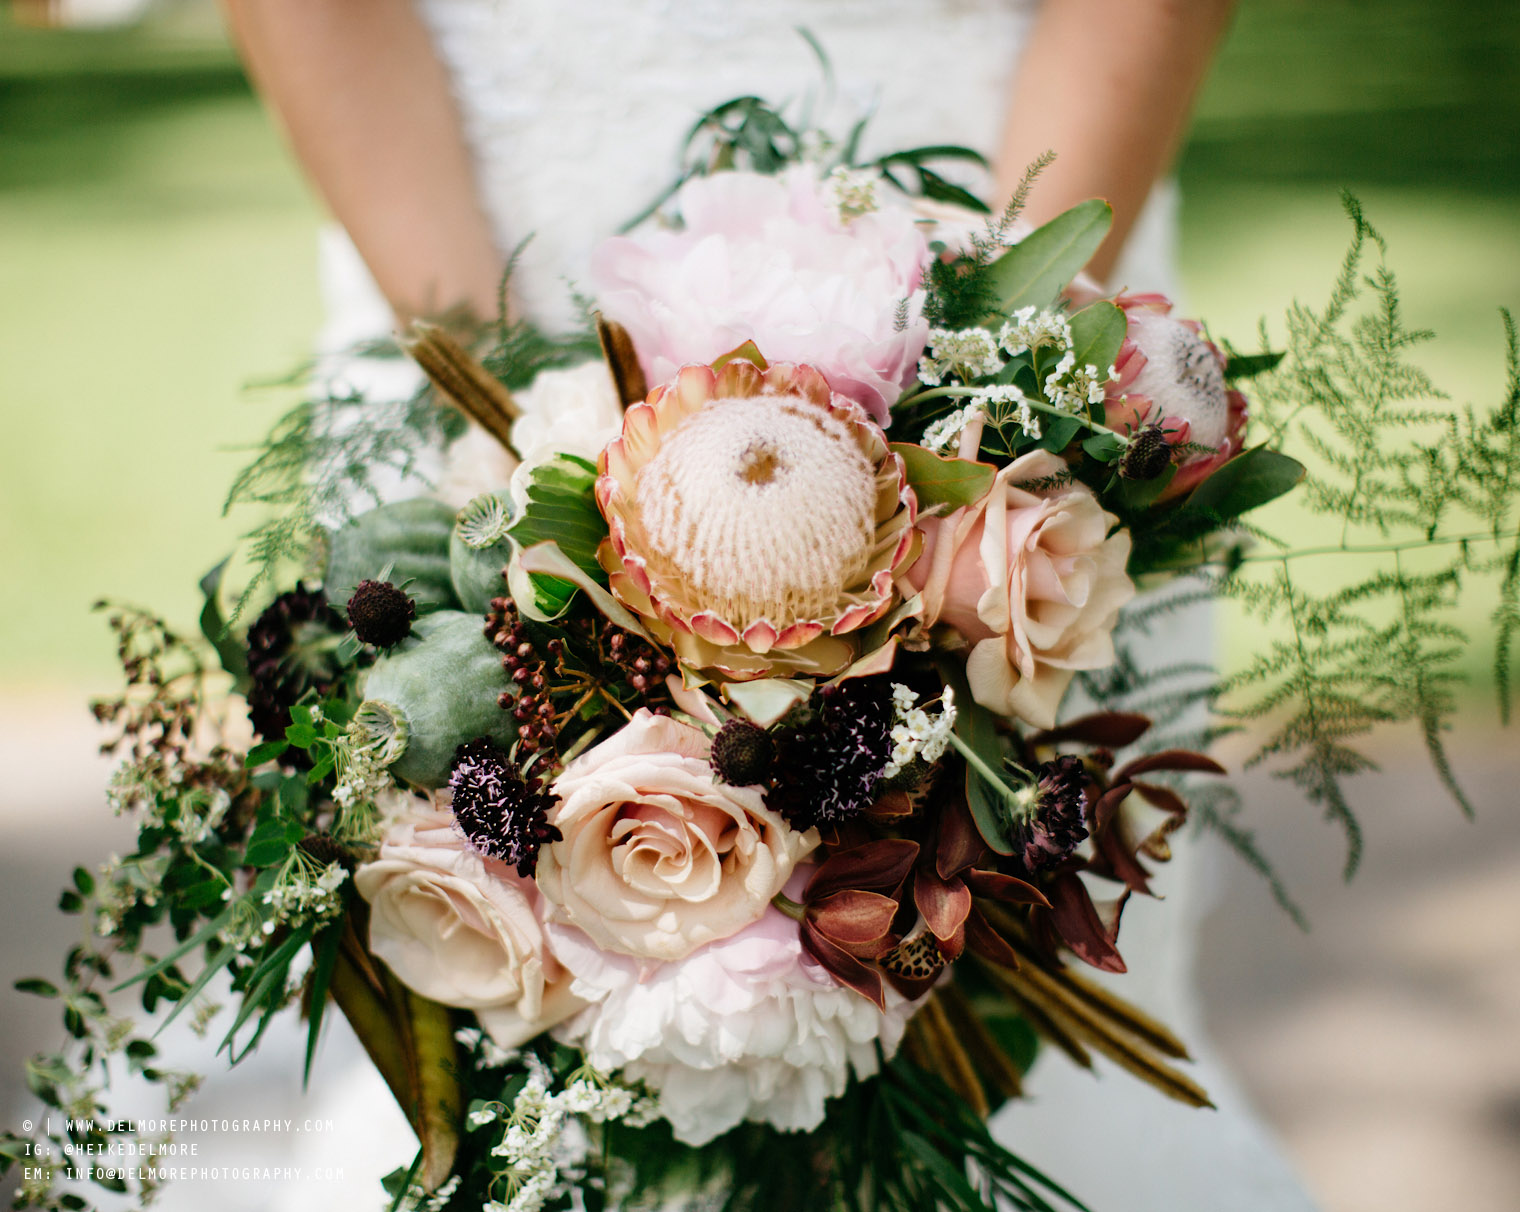 Windsor Wedding Photography Stunning Bouquet